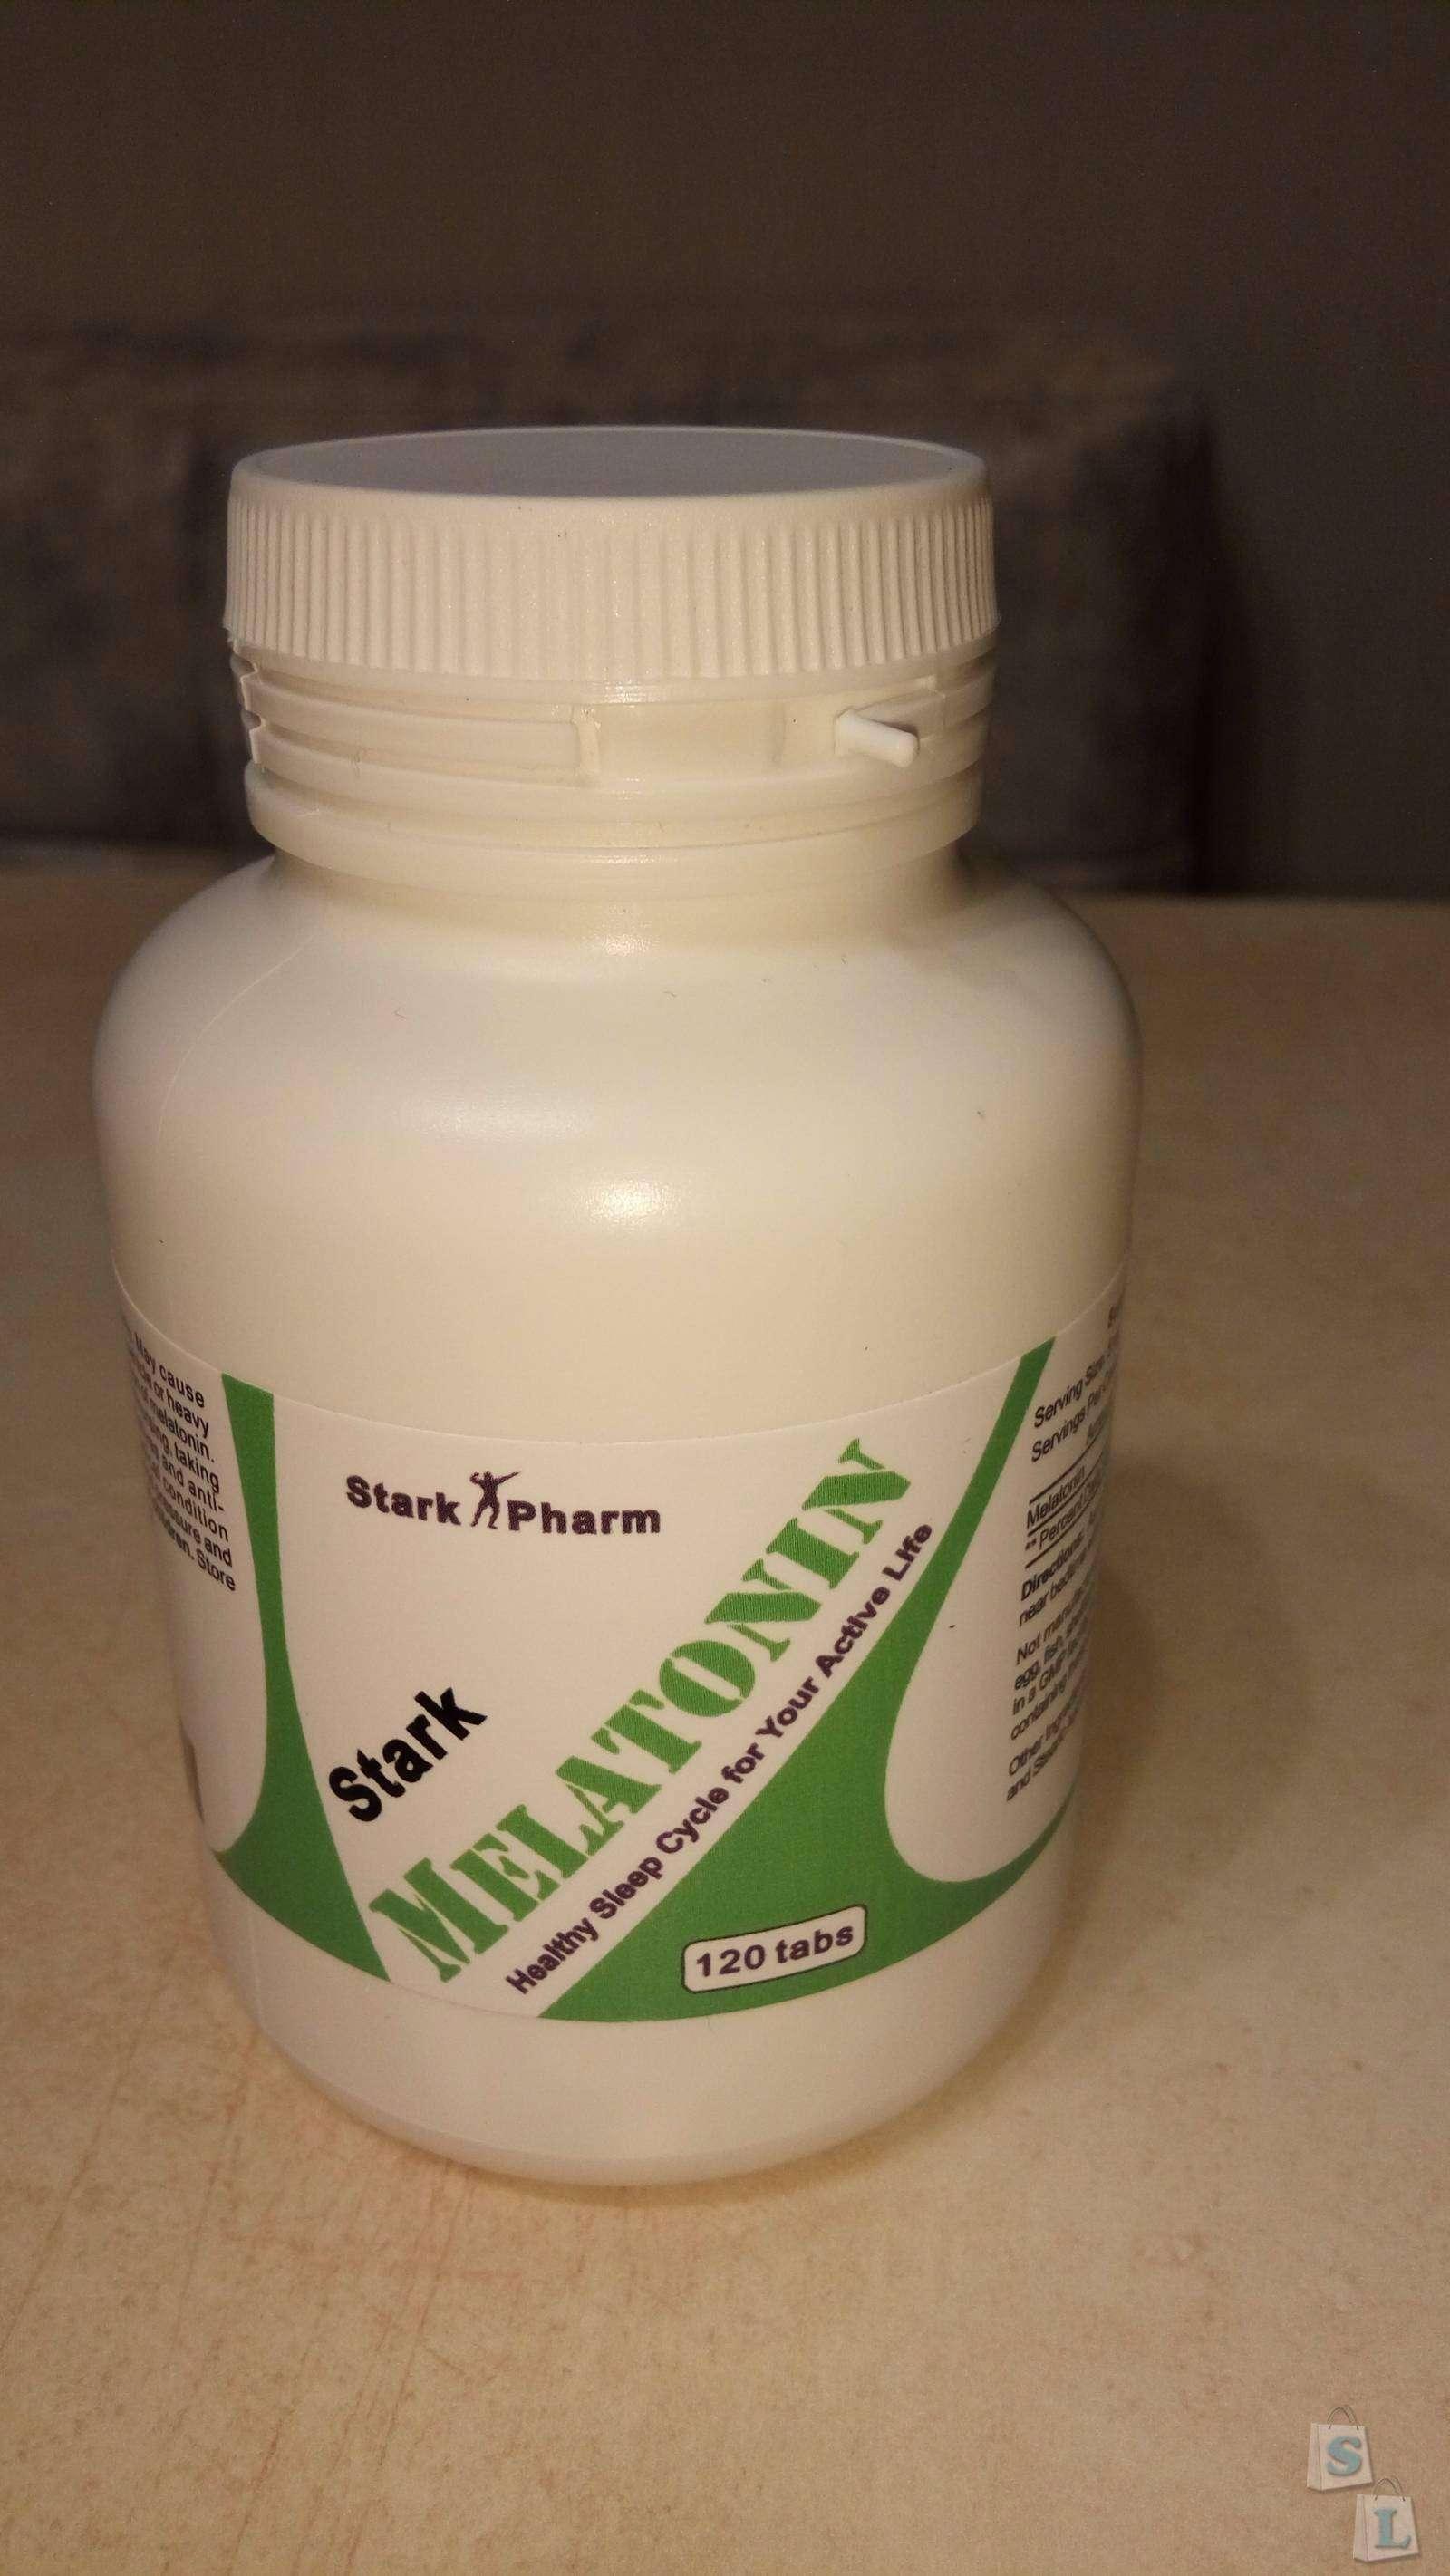 Proteininkiev: Боремся за здоровый сон - Мелатонин